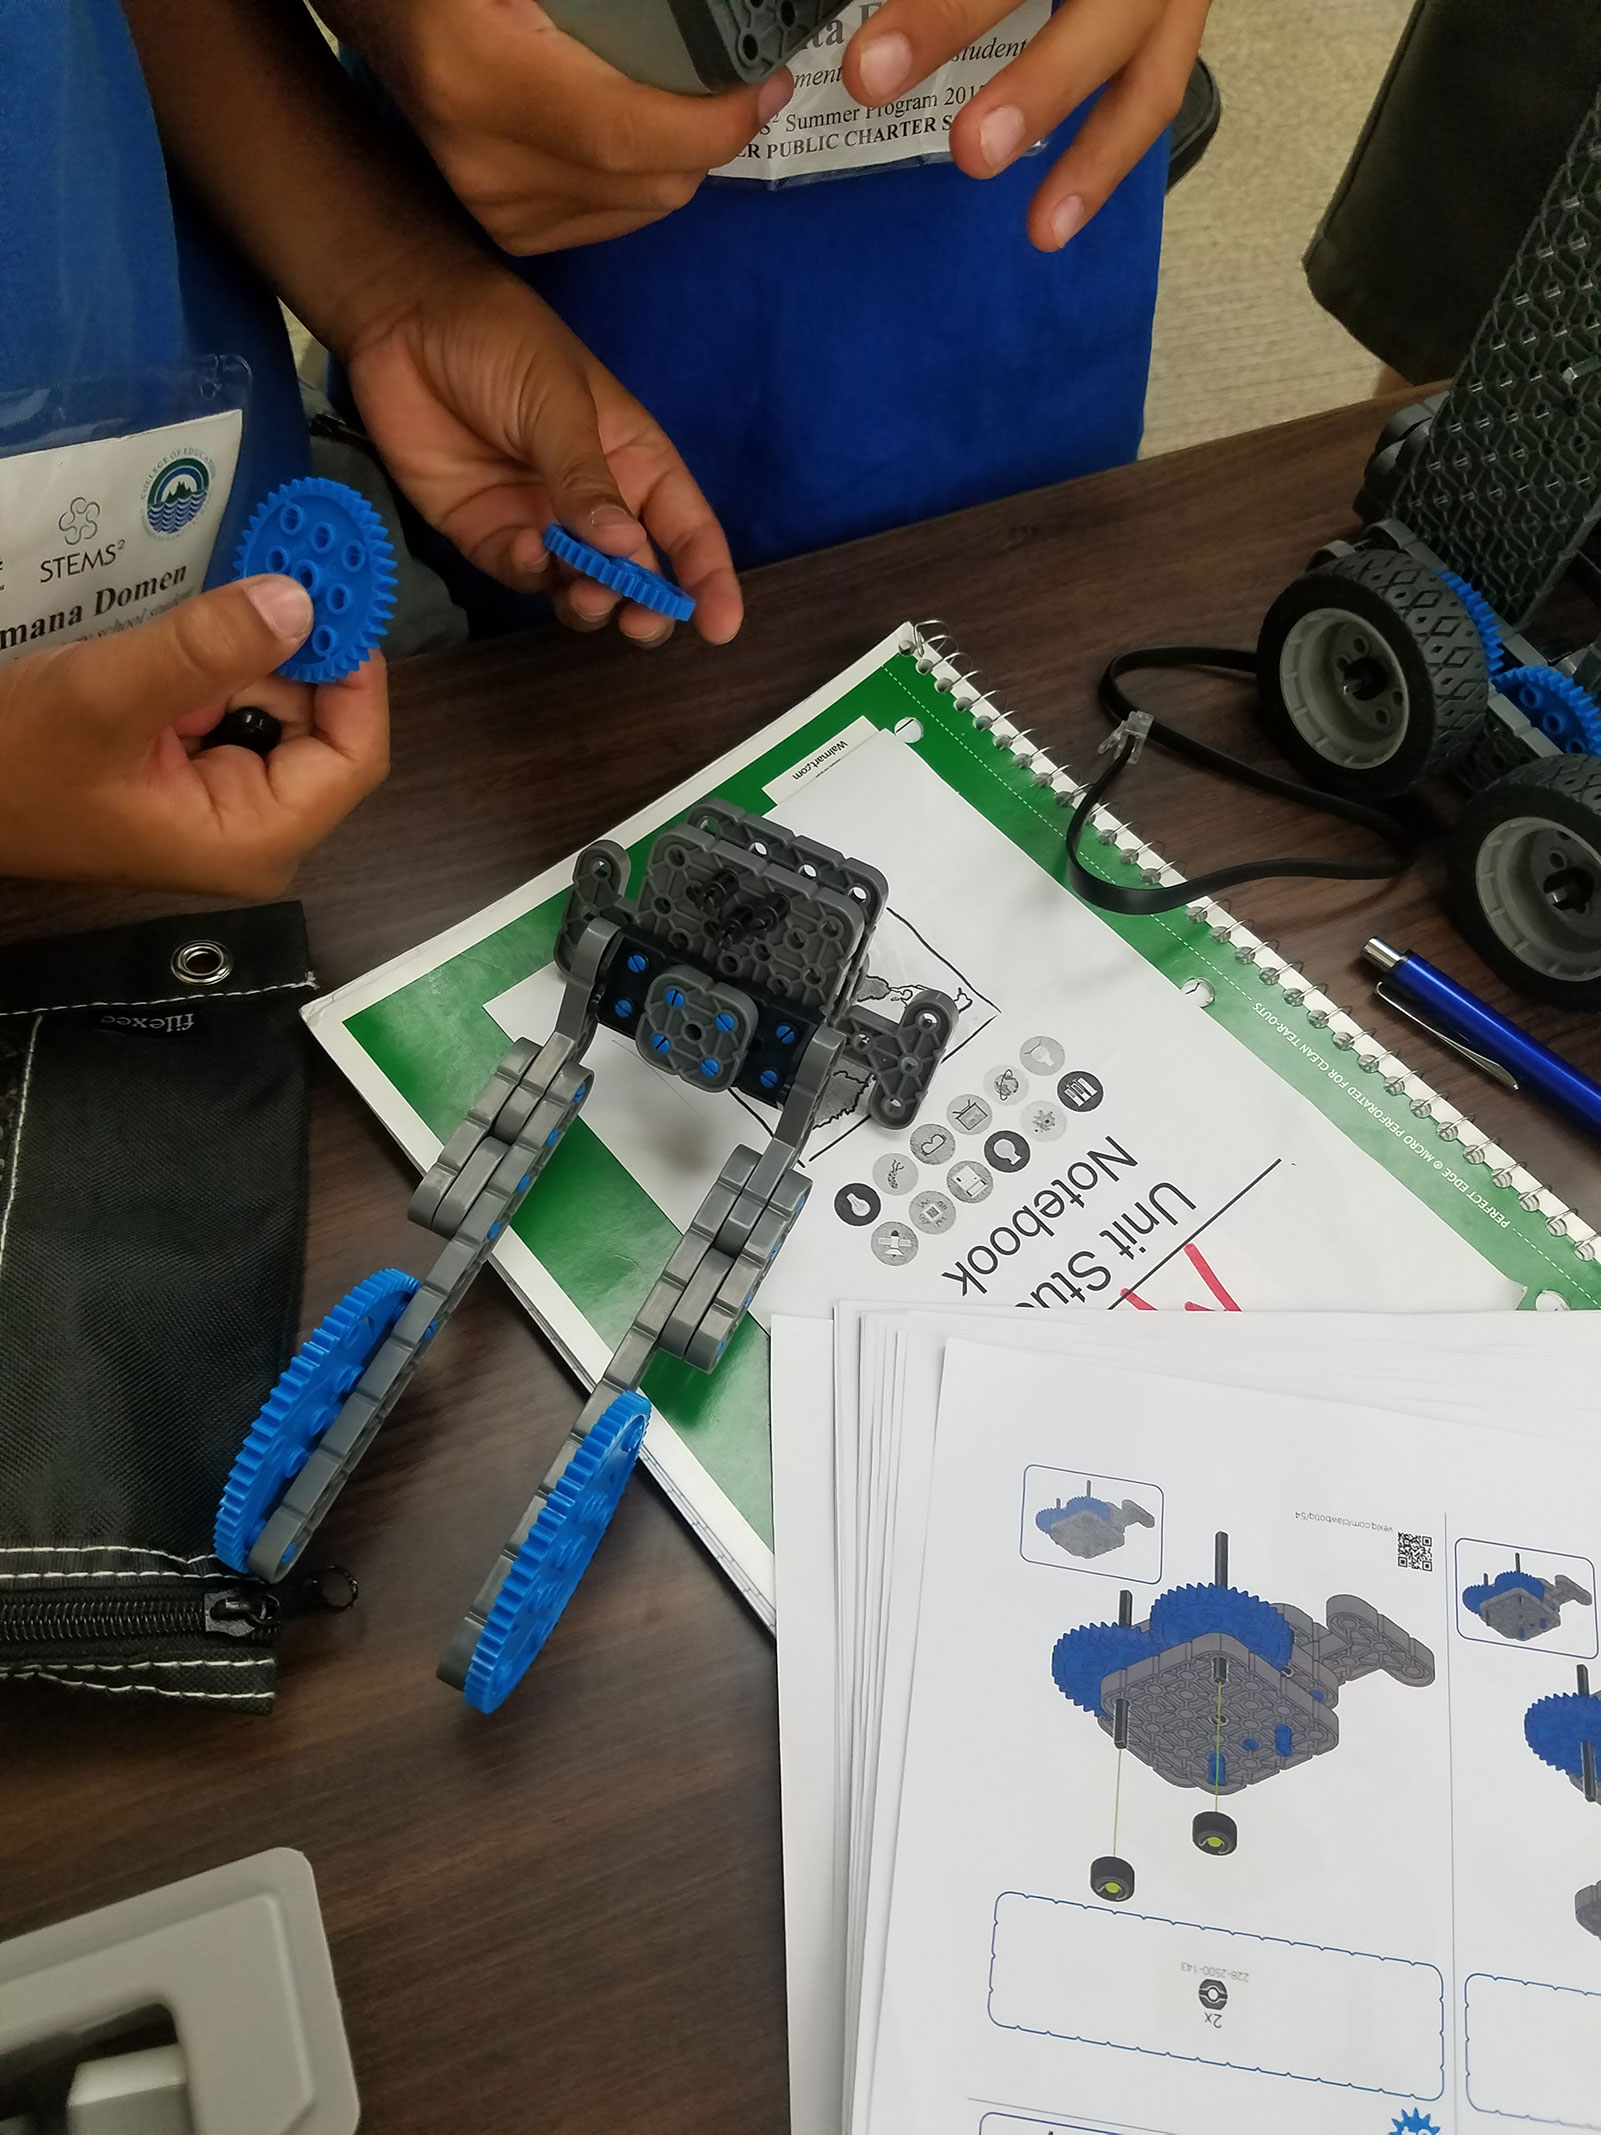 Robotics activity